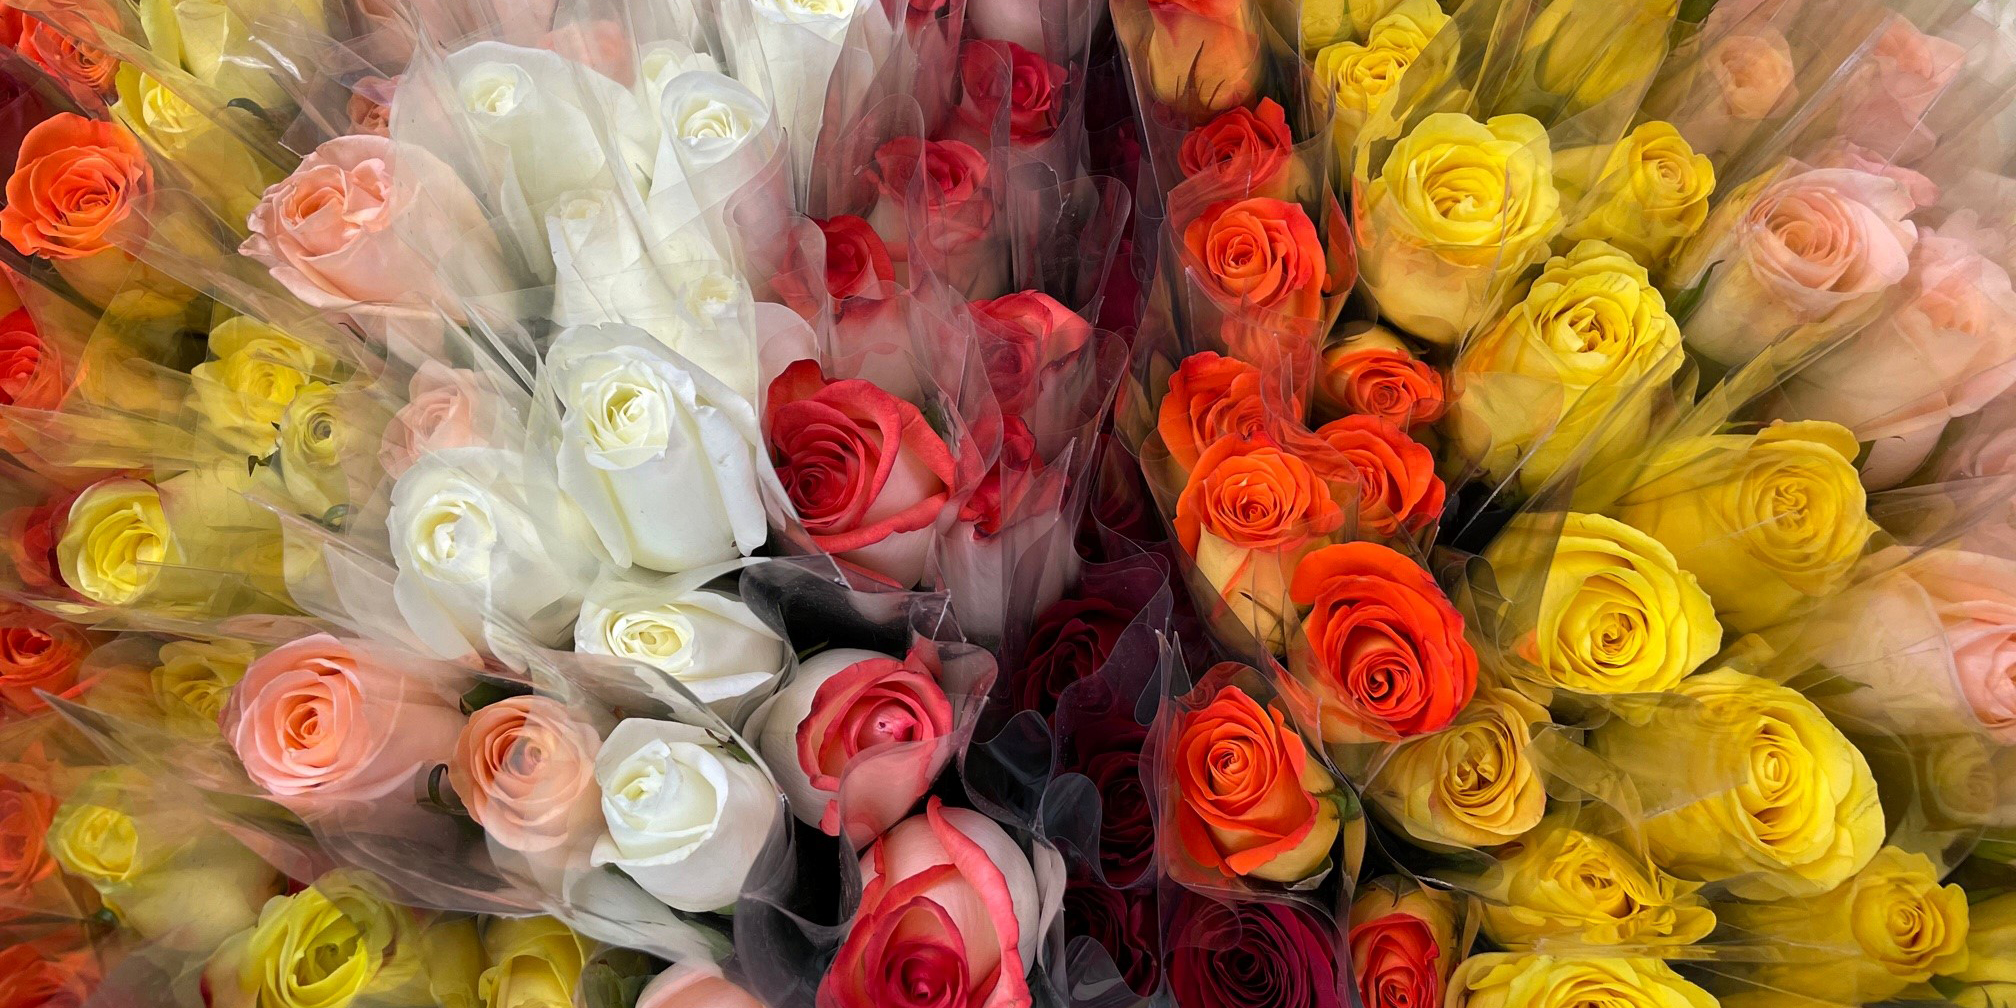 Hospice team spreads Valentine's cheer